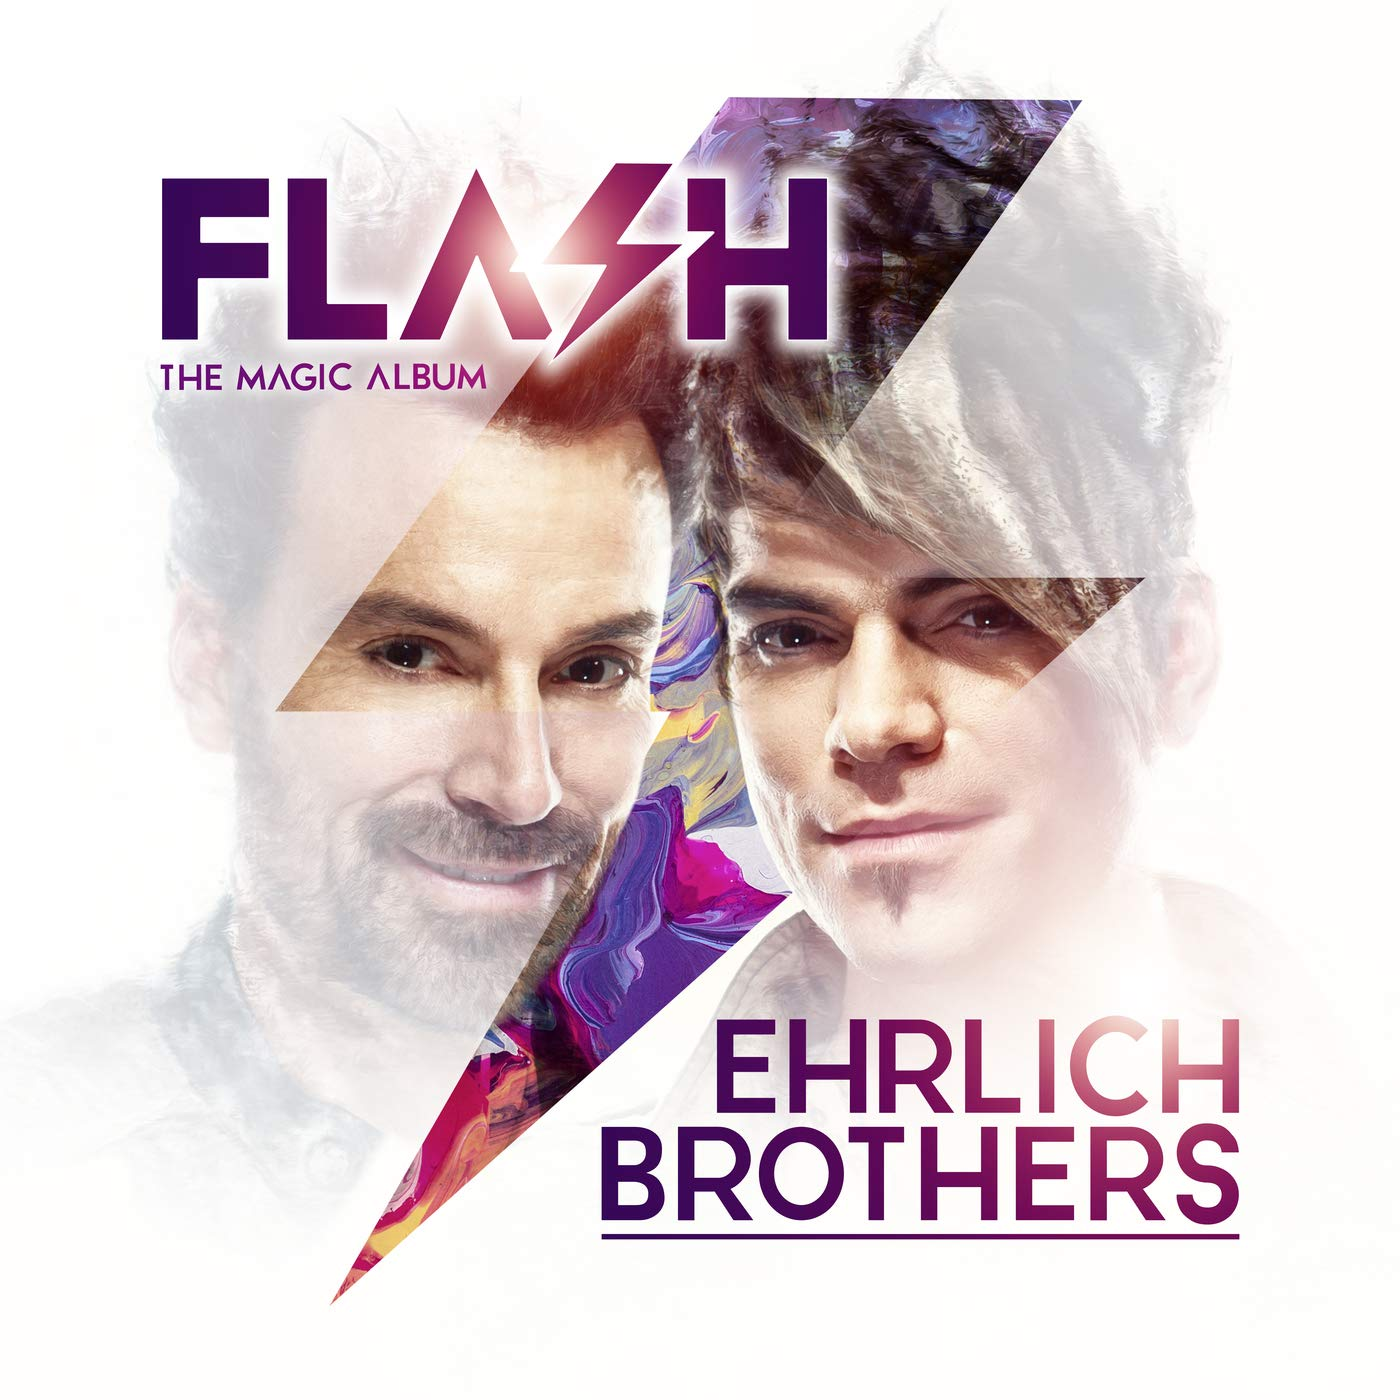 Ehrlich Brothers - Flash The Magic Album Flash The Magic (2019) [FLAC] Download